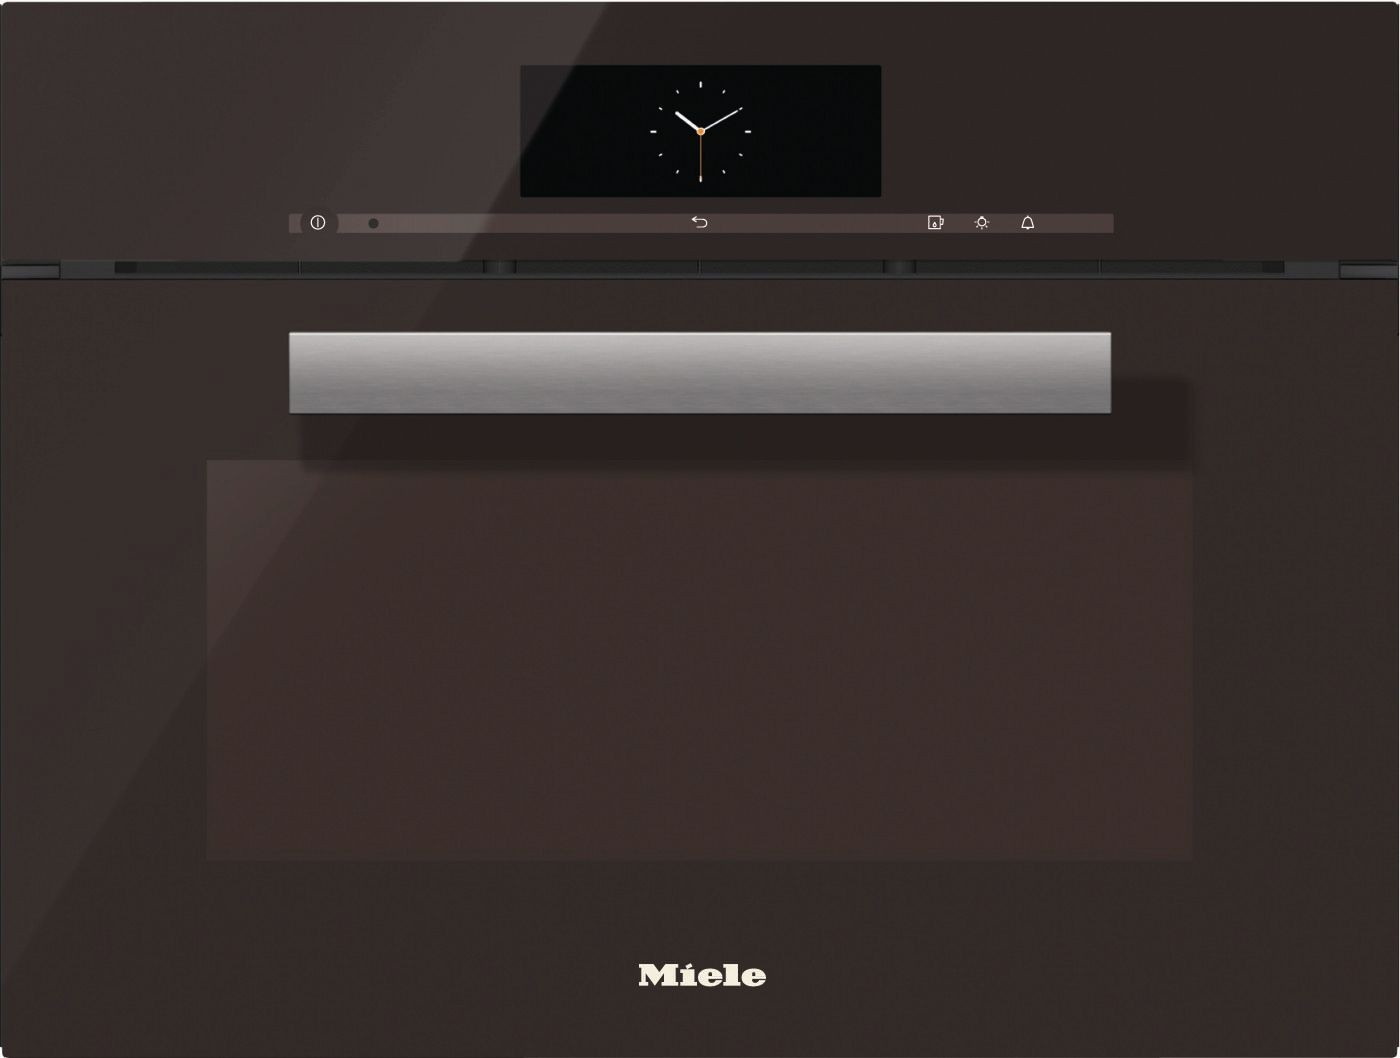 teamsix dgc 6800 havannabraun miele classic steamer. Black Bedroom Furniture Sets. Home Design Ideas